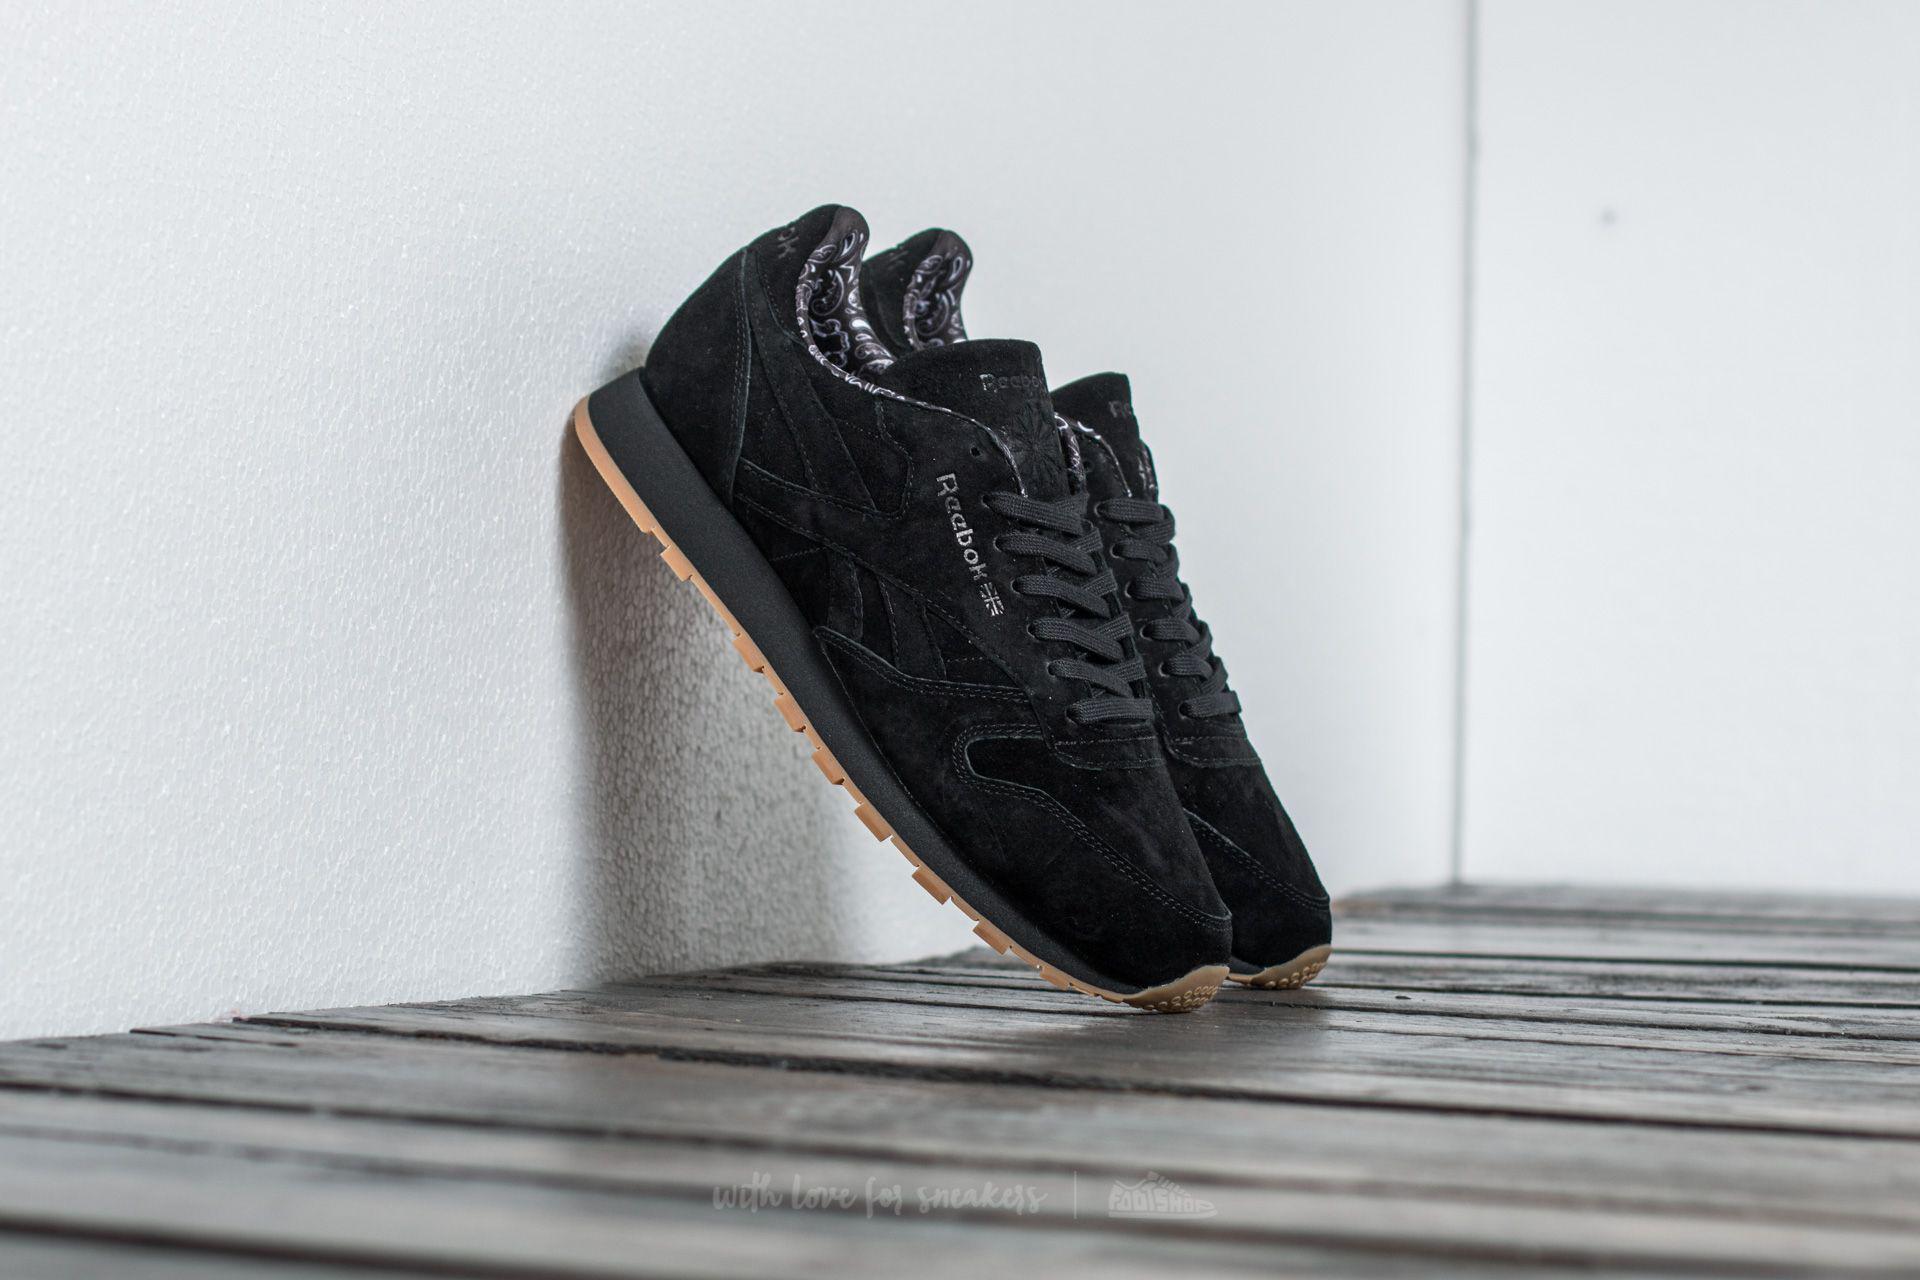 d0c932293908a Lyst - Reebok Classic Leather Tdc Black  White-gum in Black for Men